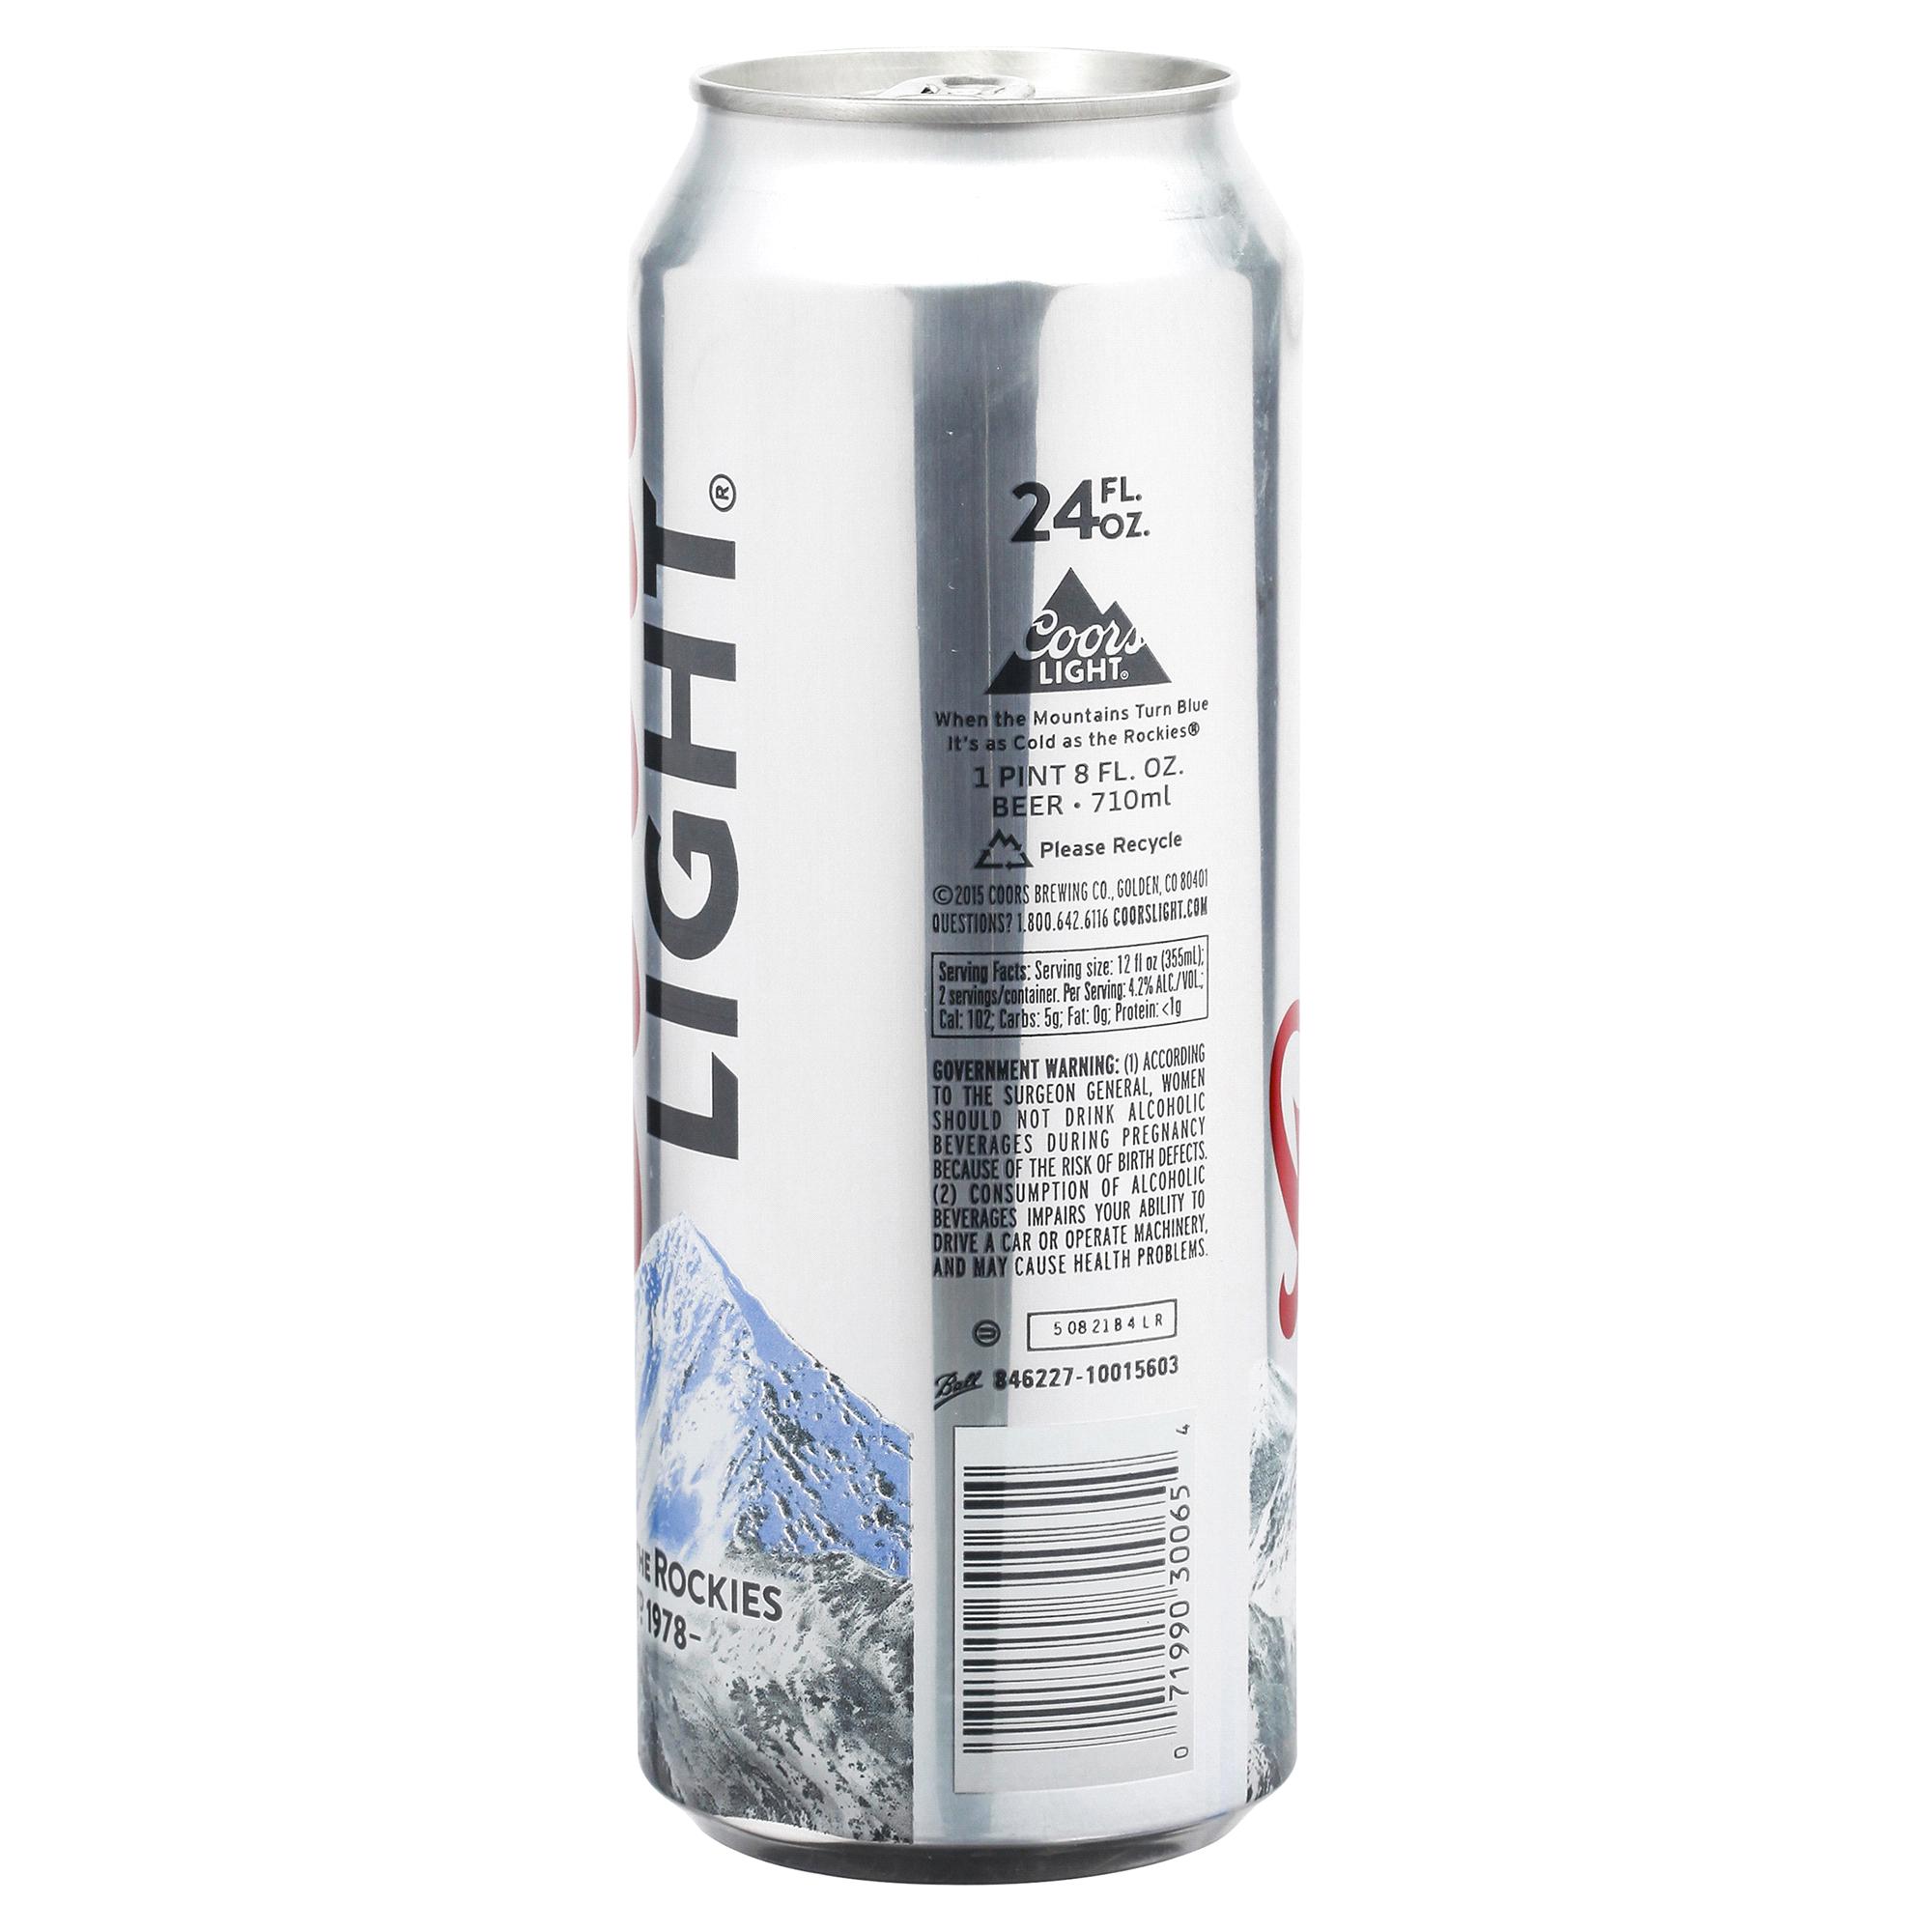 Coors Light Lager Beer 24 Fl. Oz. Single Can 4.2% ABV | Meijer.com